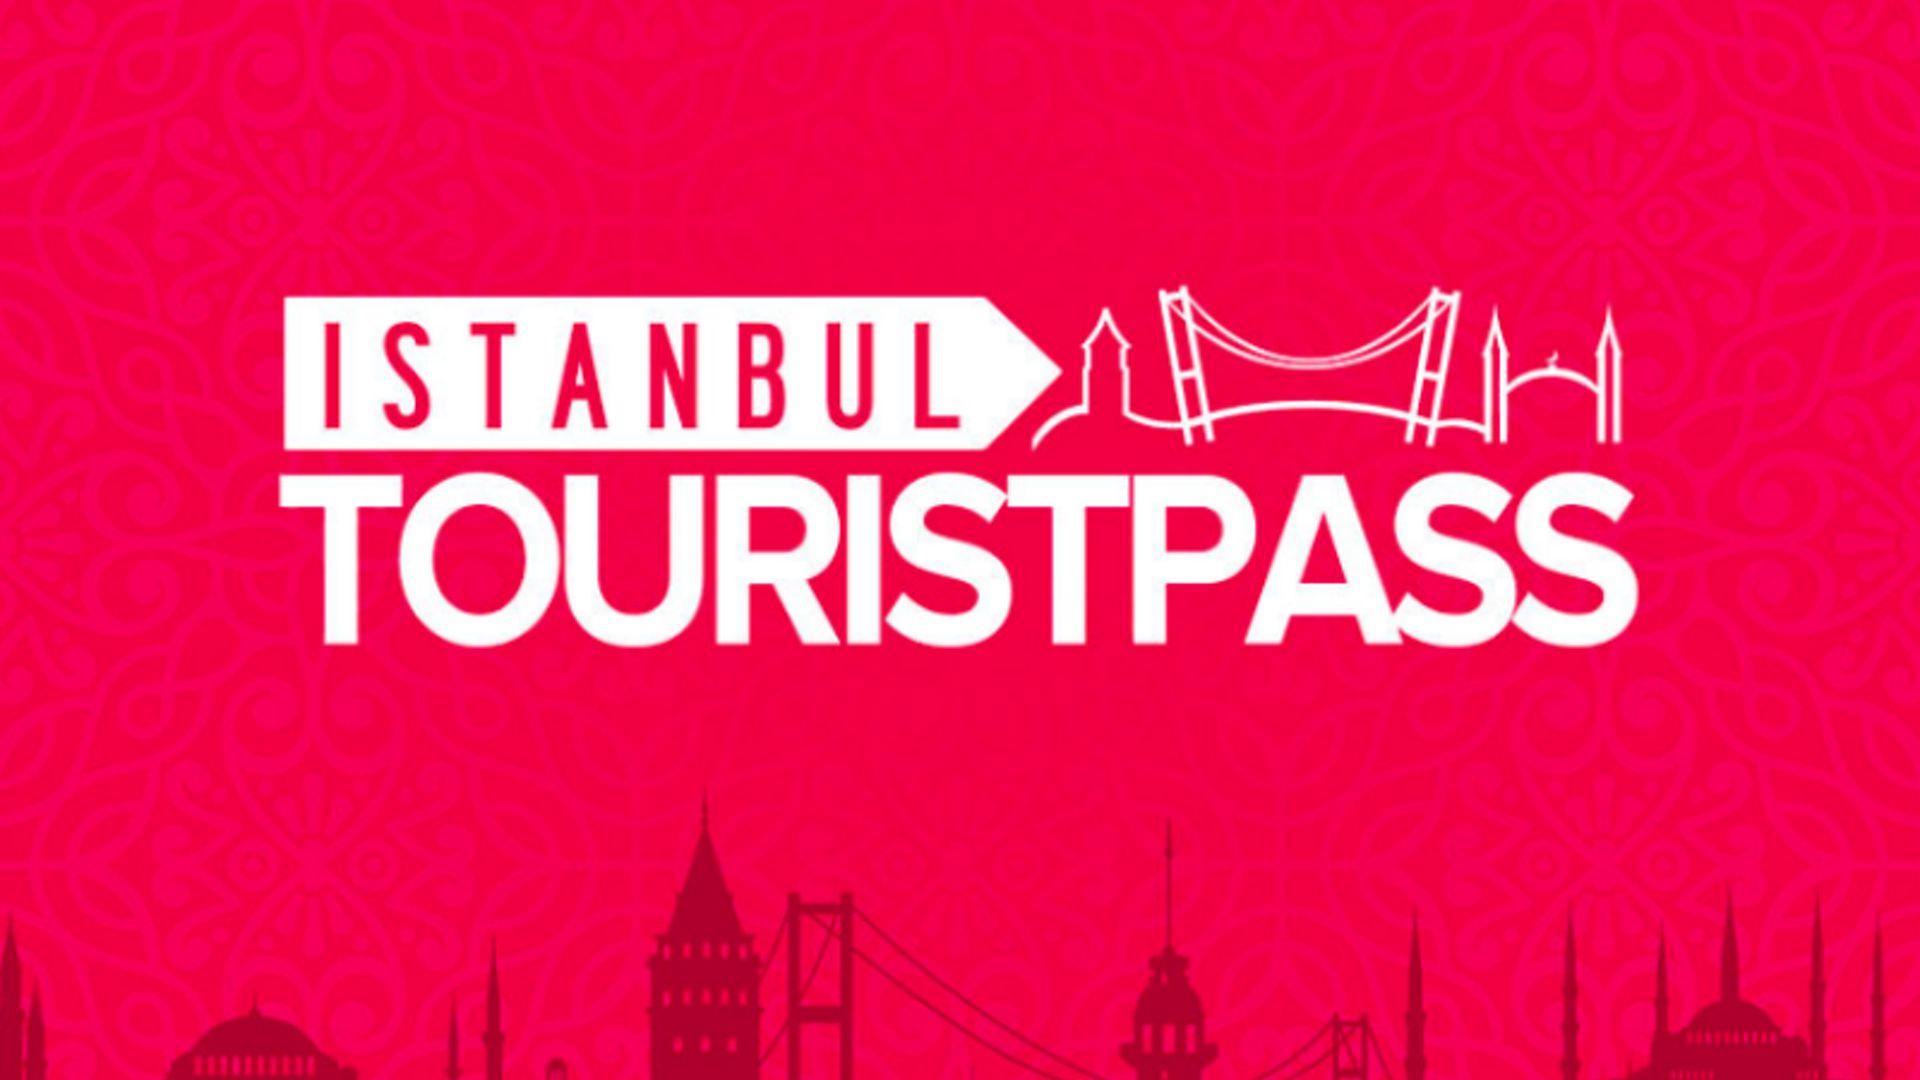 Istanbul City Tourist Pass